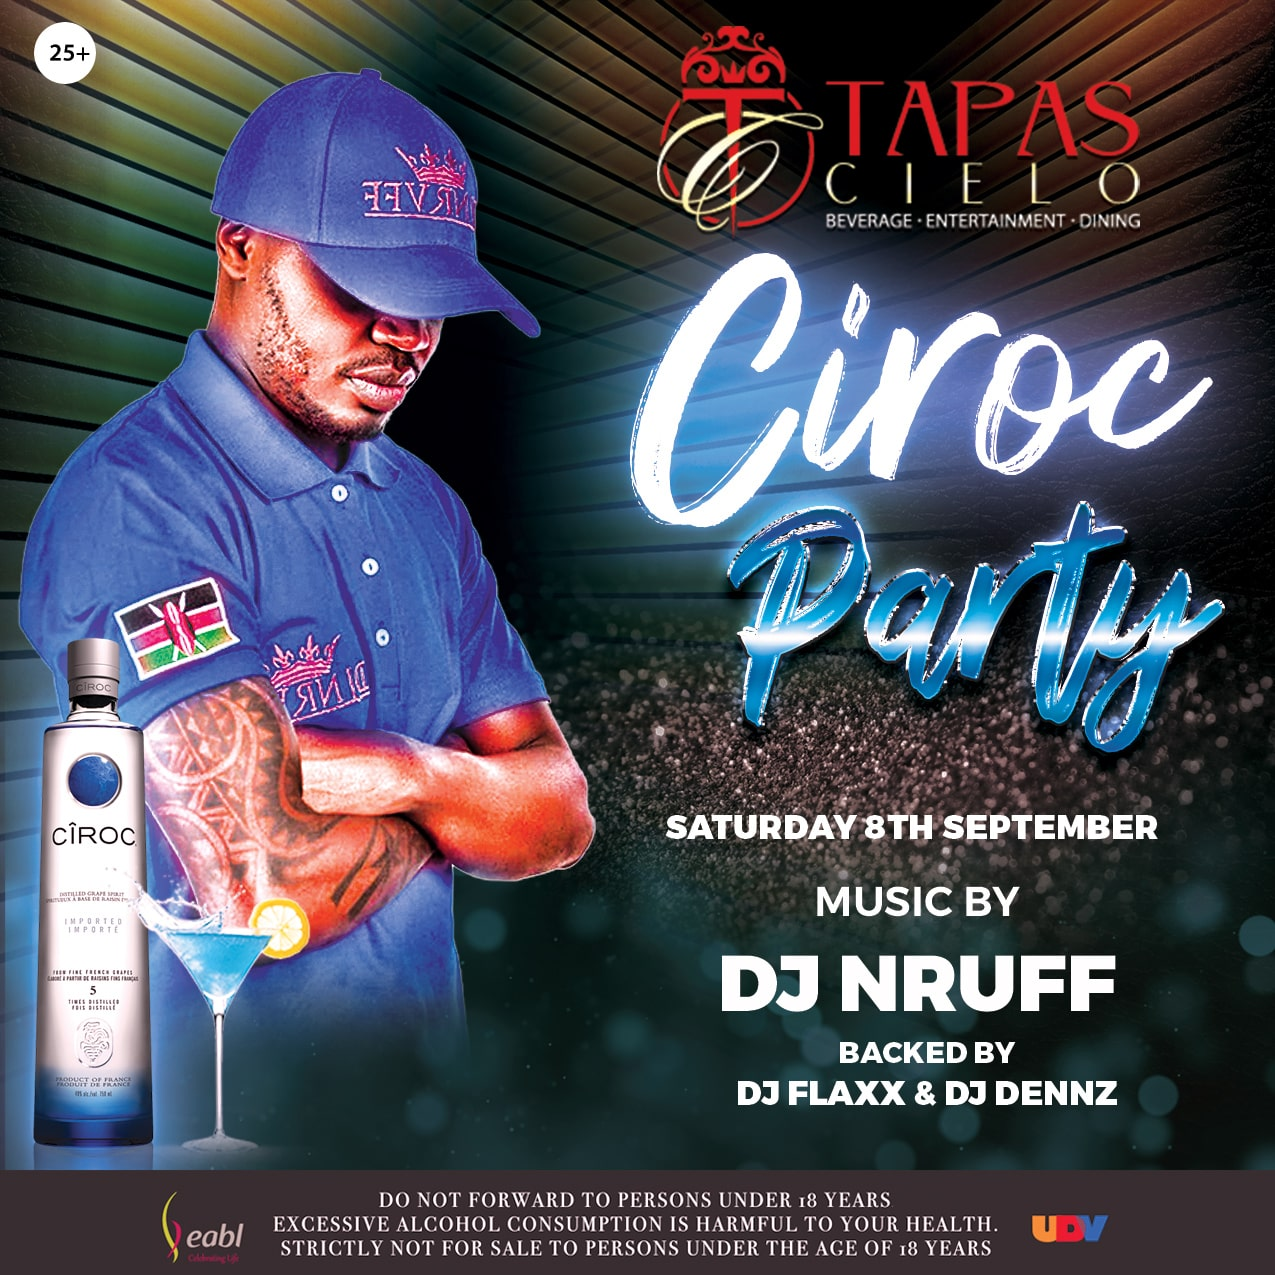 ciroc-party-nruff-min